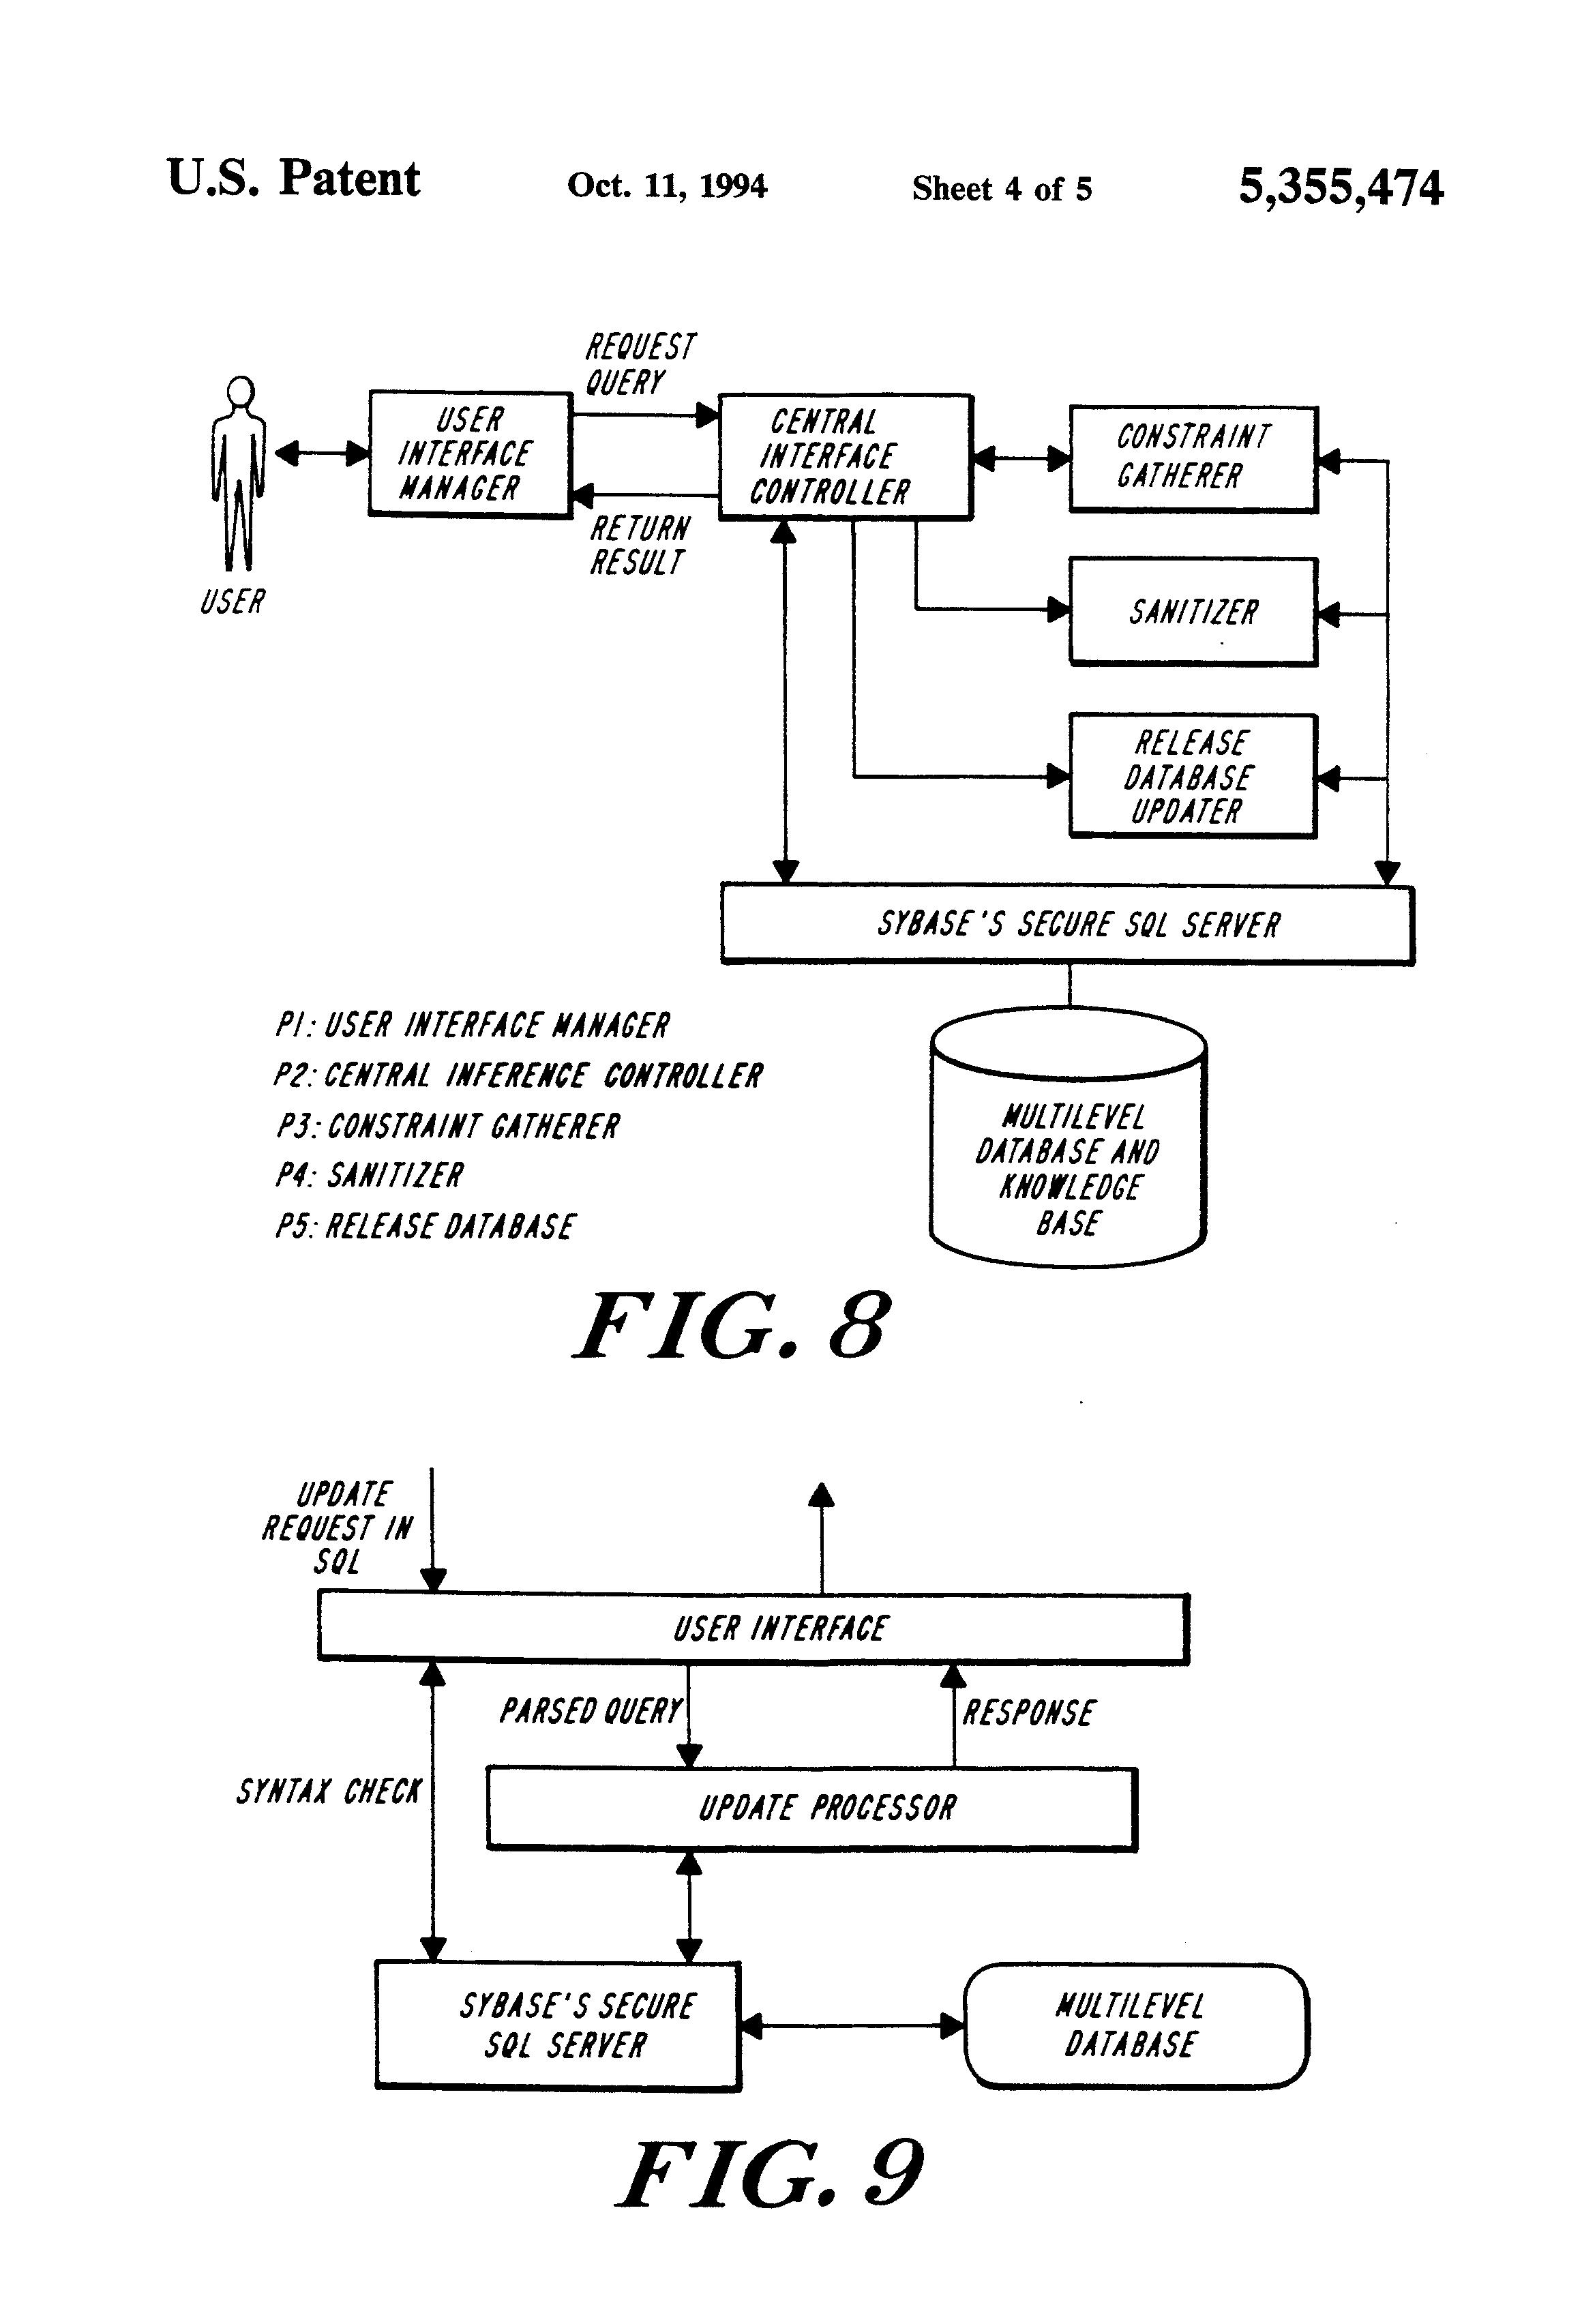 US 5355474 A - System For Multilevel Secure Database